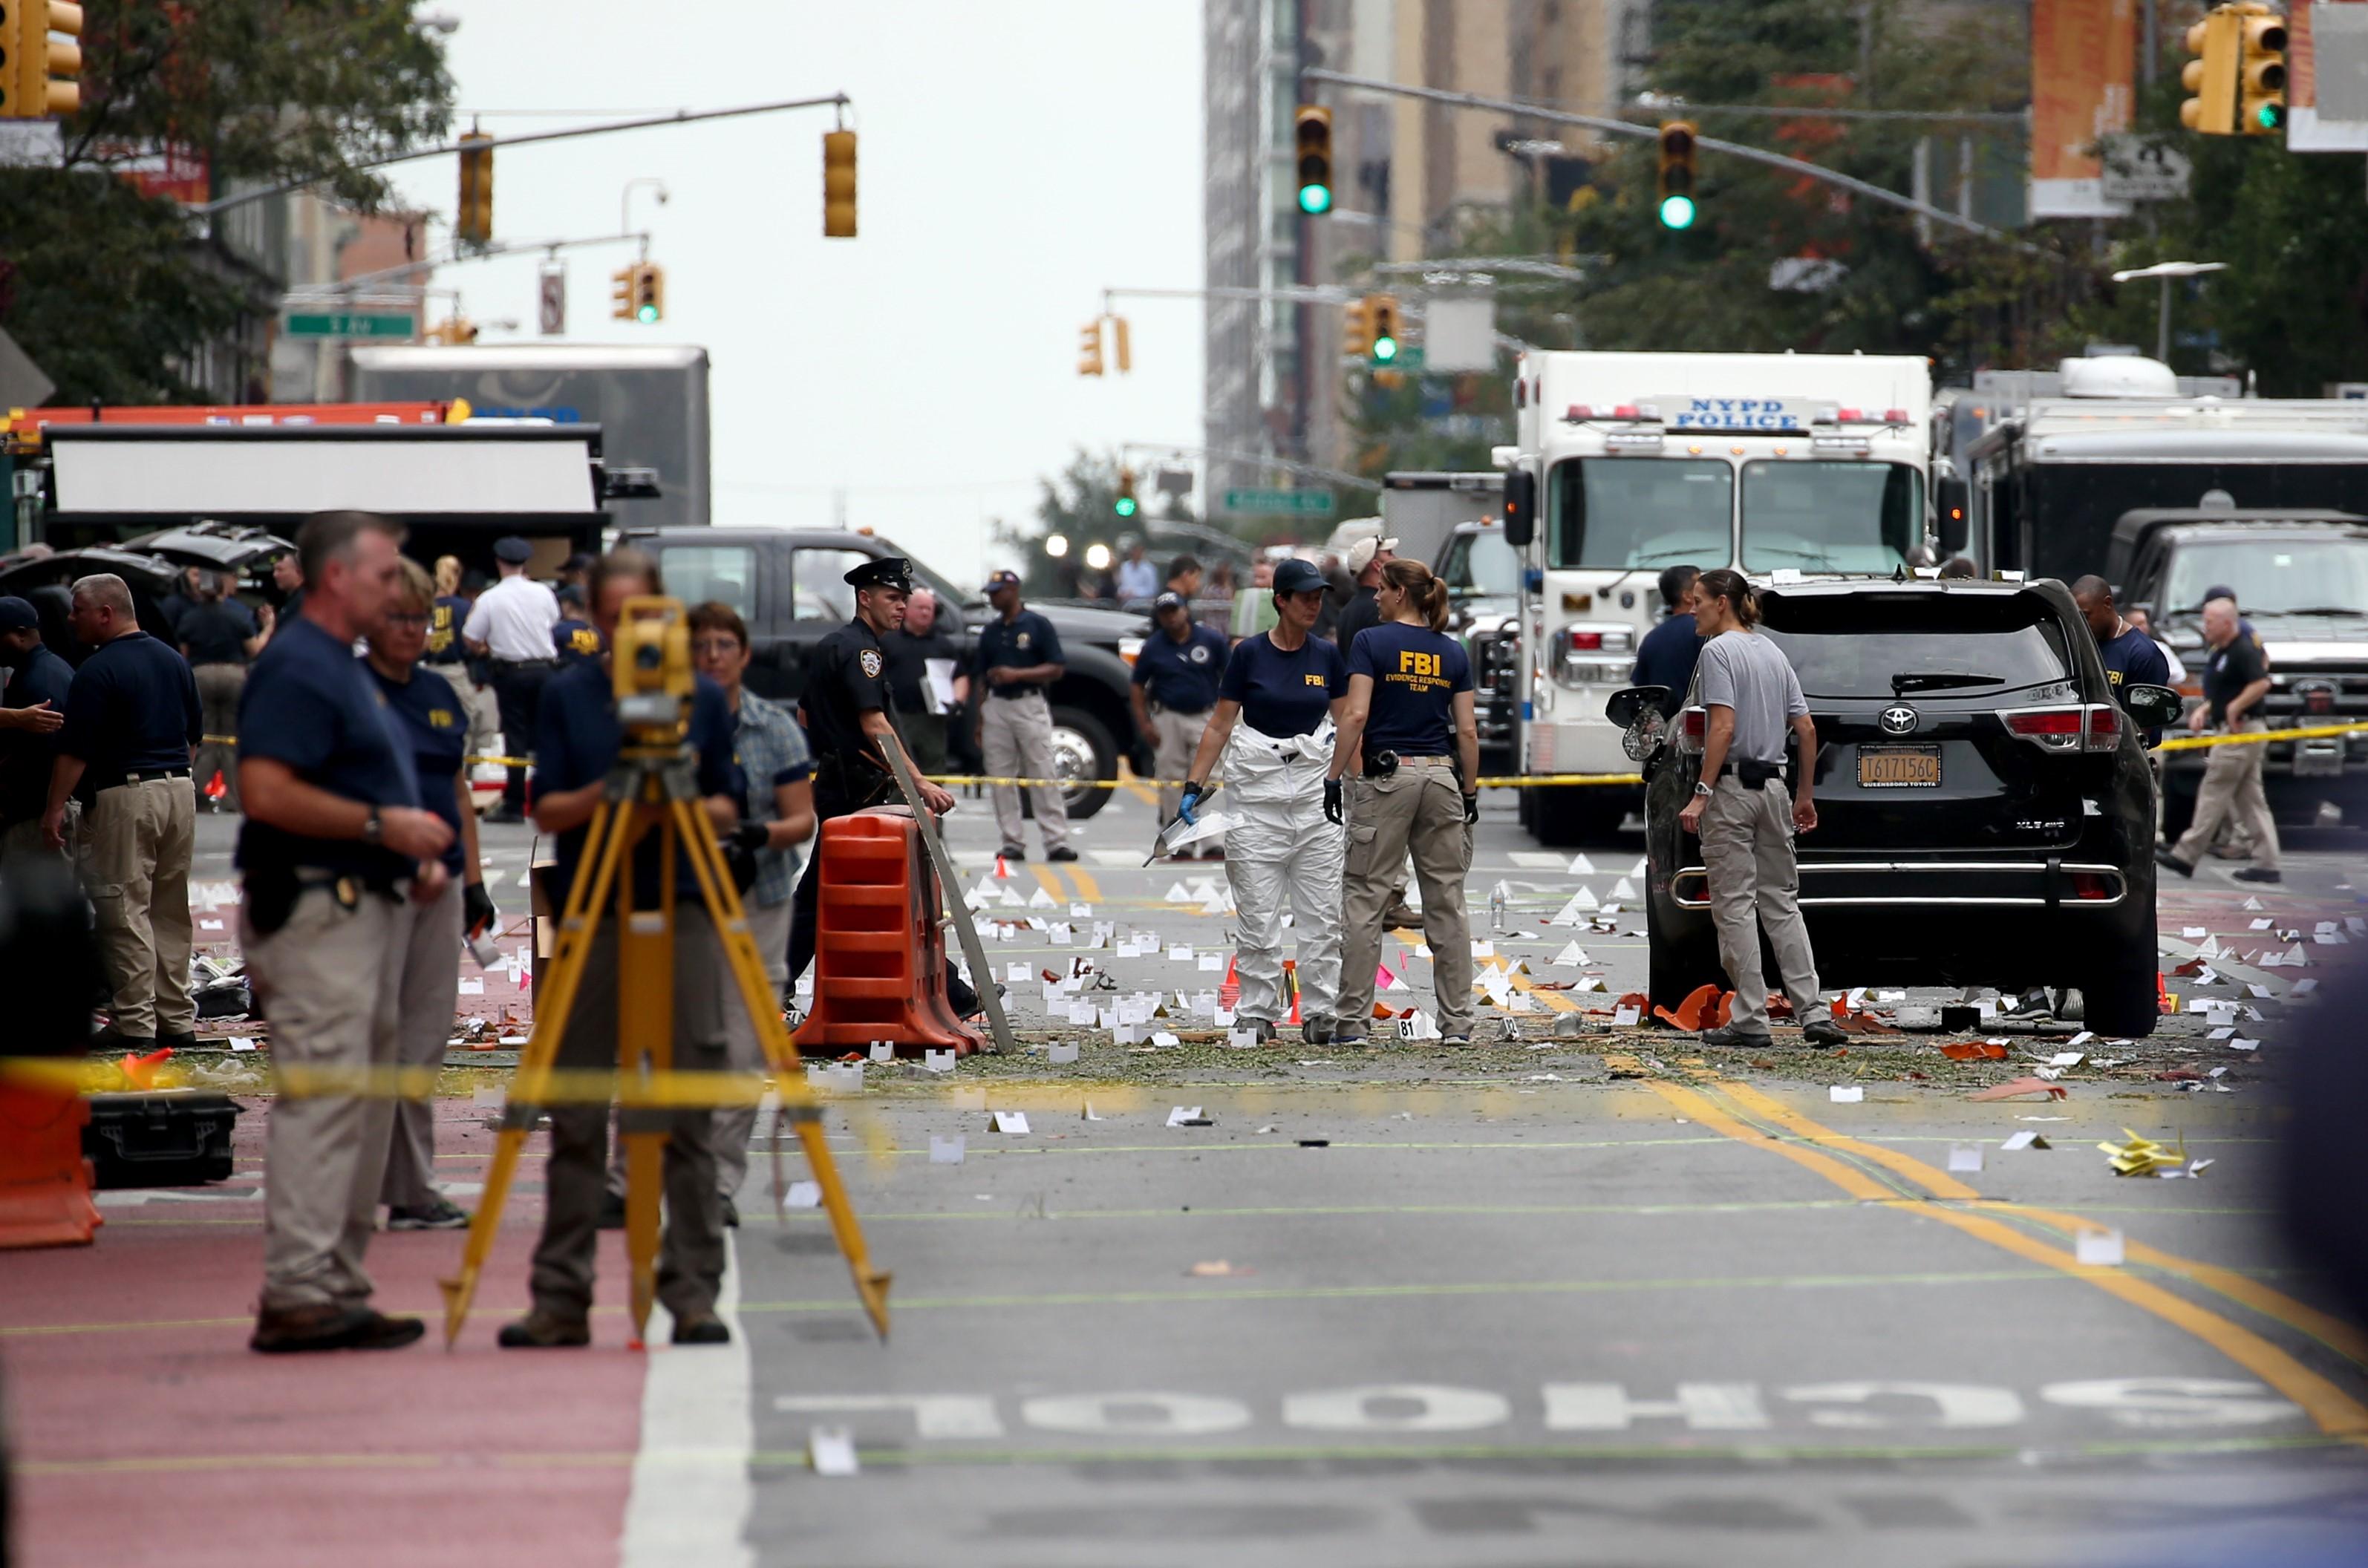 Explosion in Chelsea neighbourhood